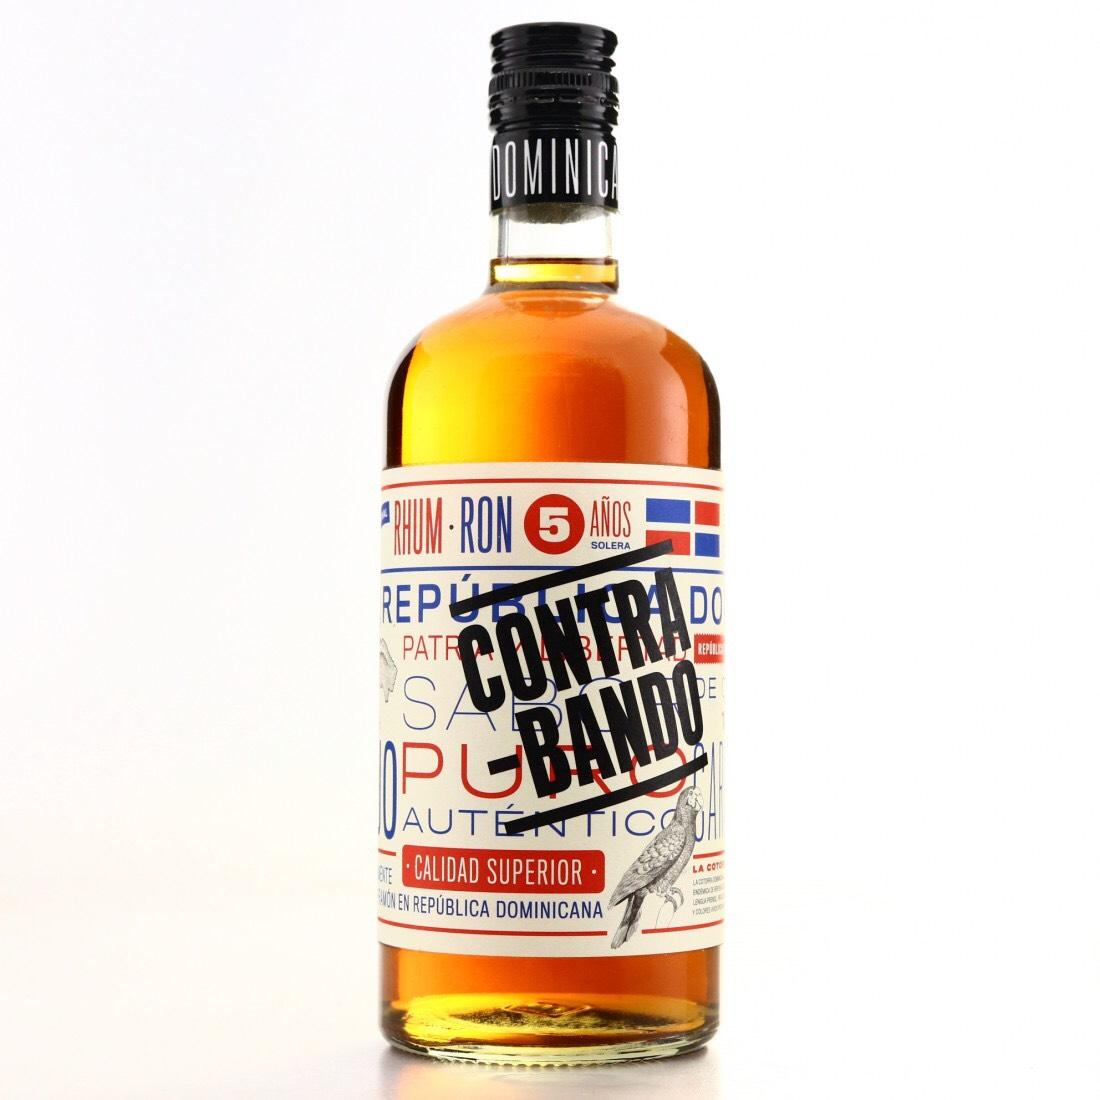 Bottle image of Contrabando